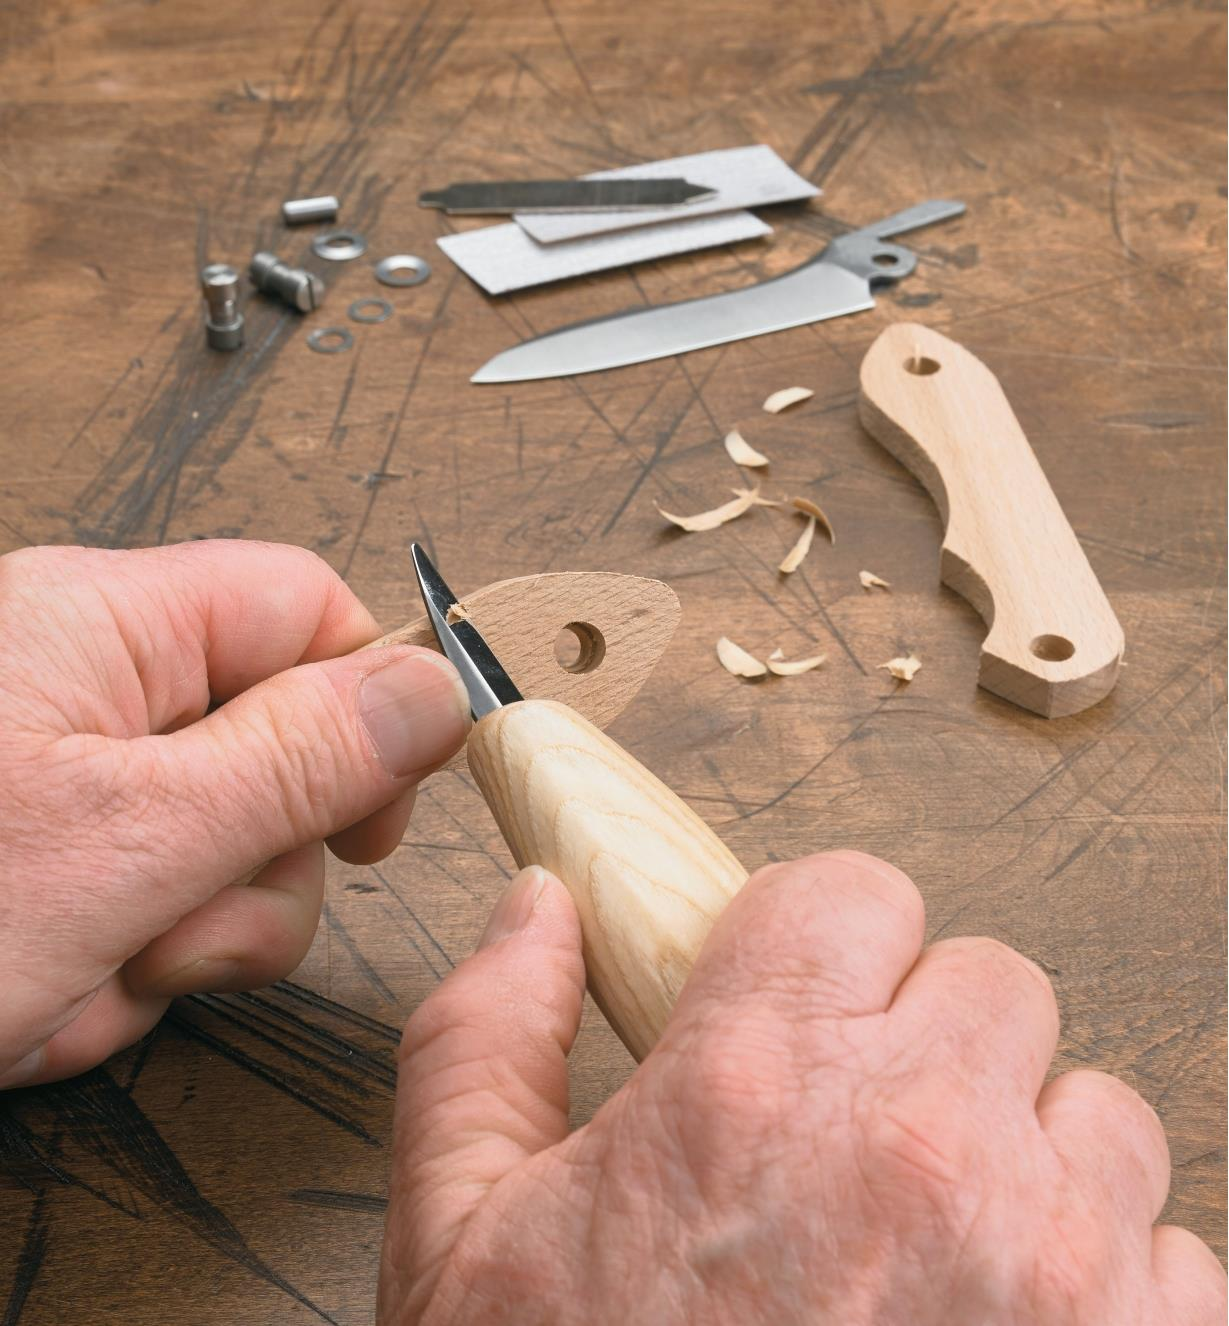 60K1102 - Japanese Folding Knife Kit